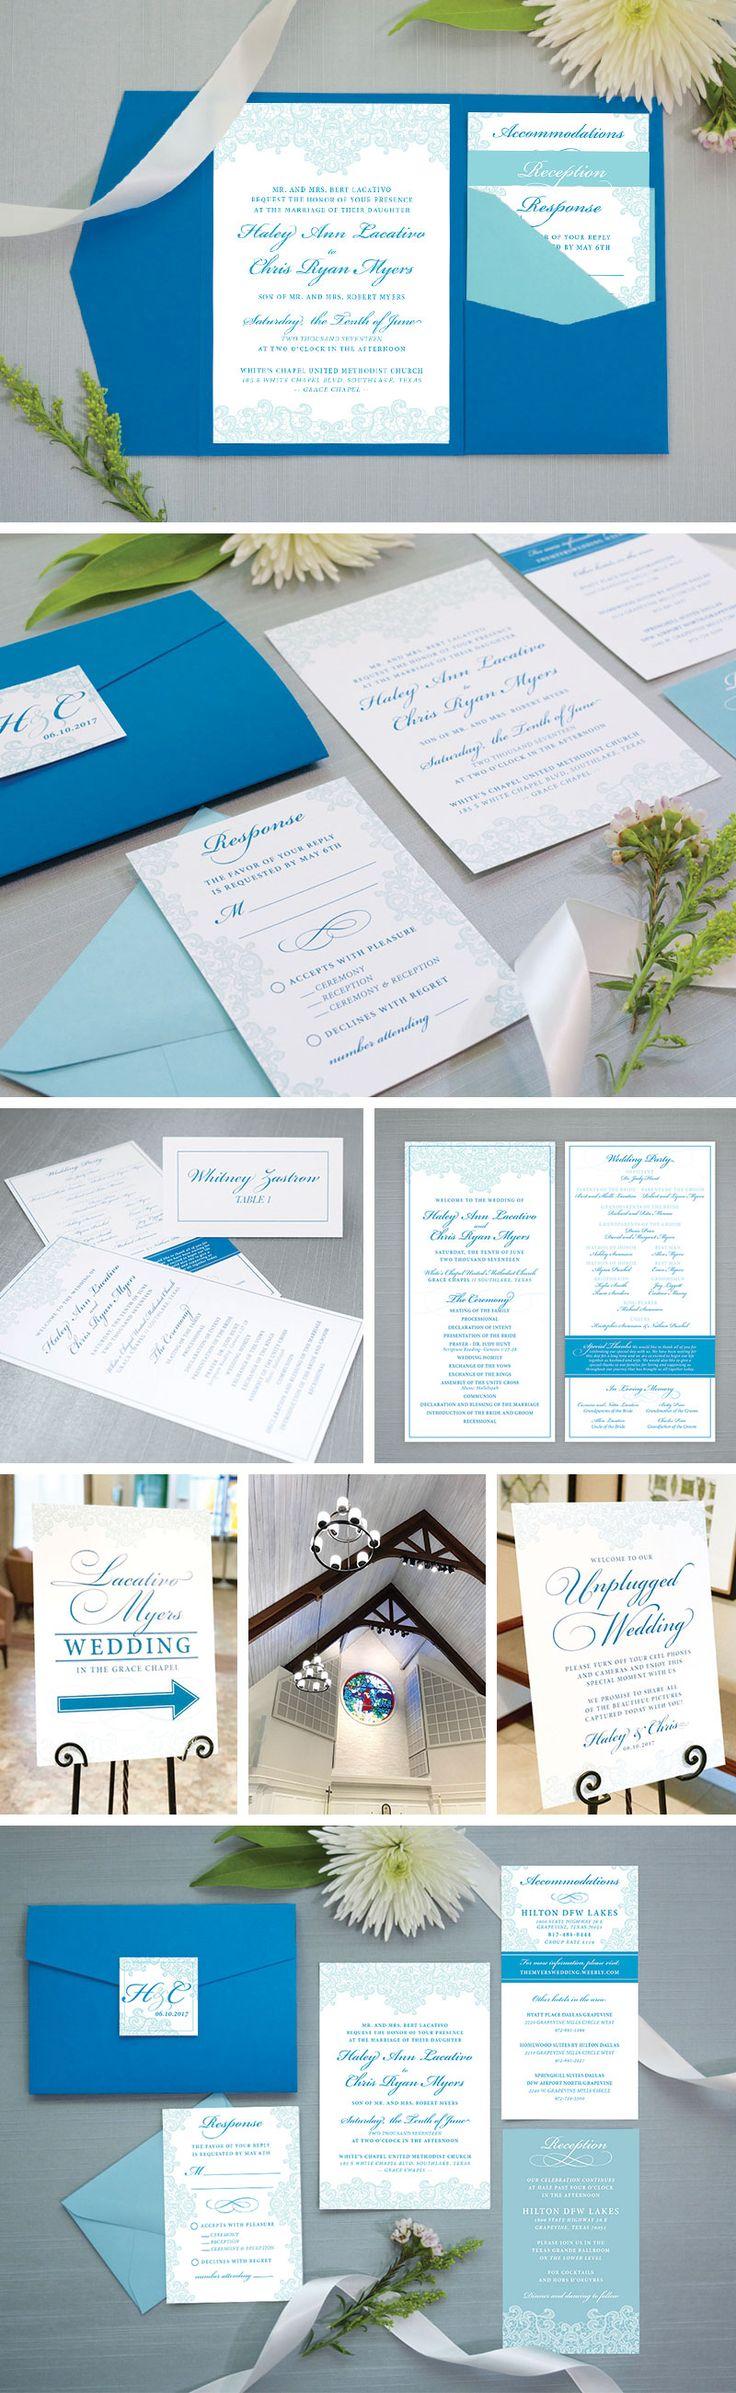 Elegant Lace Pocket Wedding Invitation Suite | Classic Wedding Invitations | Branded Weddings | Ceremony Signs | Unplugged Wedding | Custom Wedding Stationery